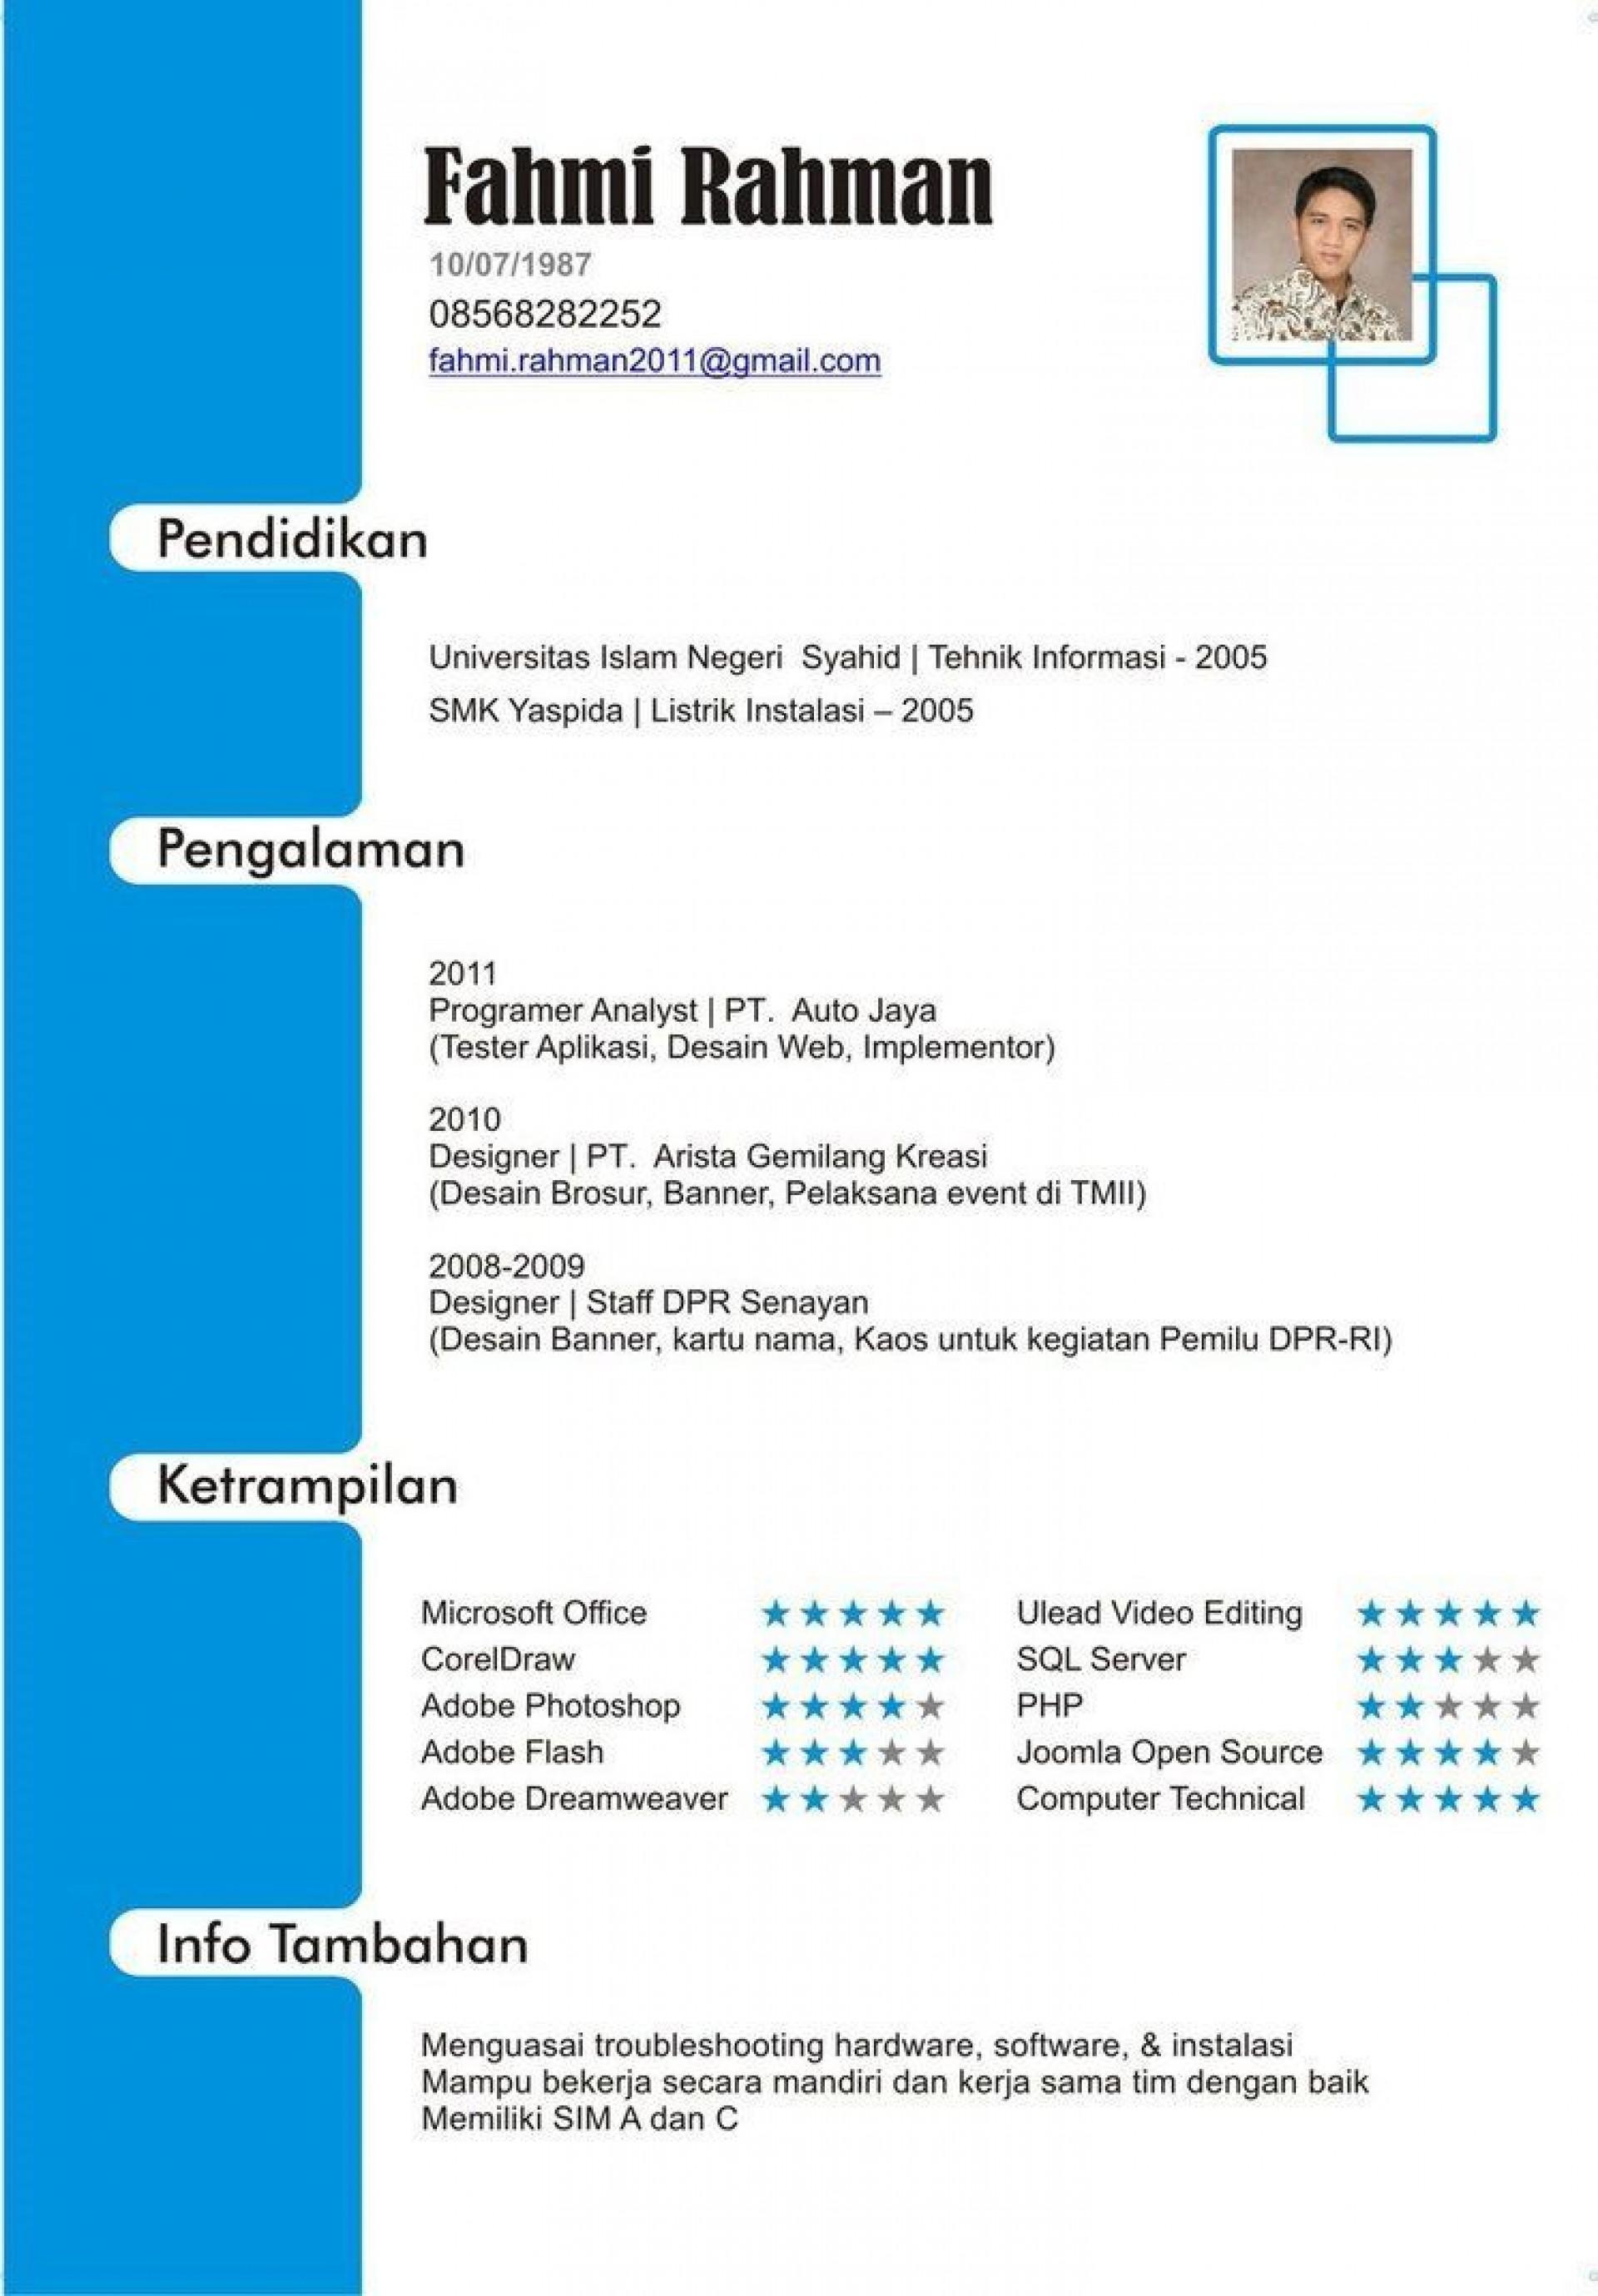 001 Magnificent Curriculum Vitae Template Free Design  Sample Download Pdf Google Doc1920